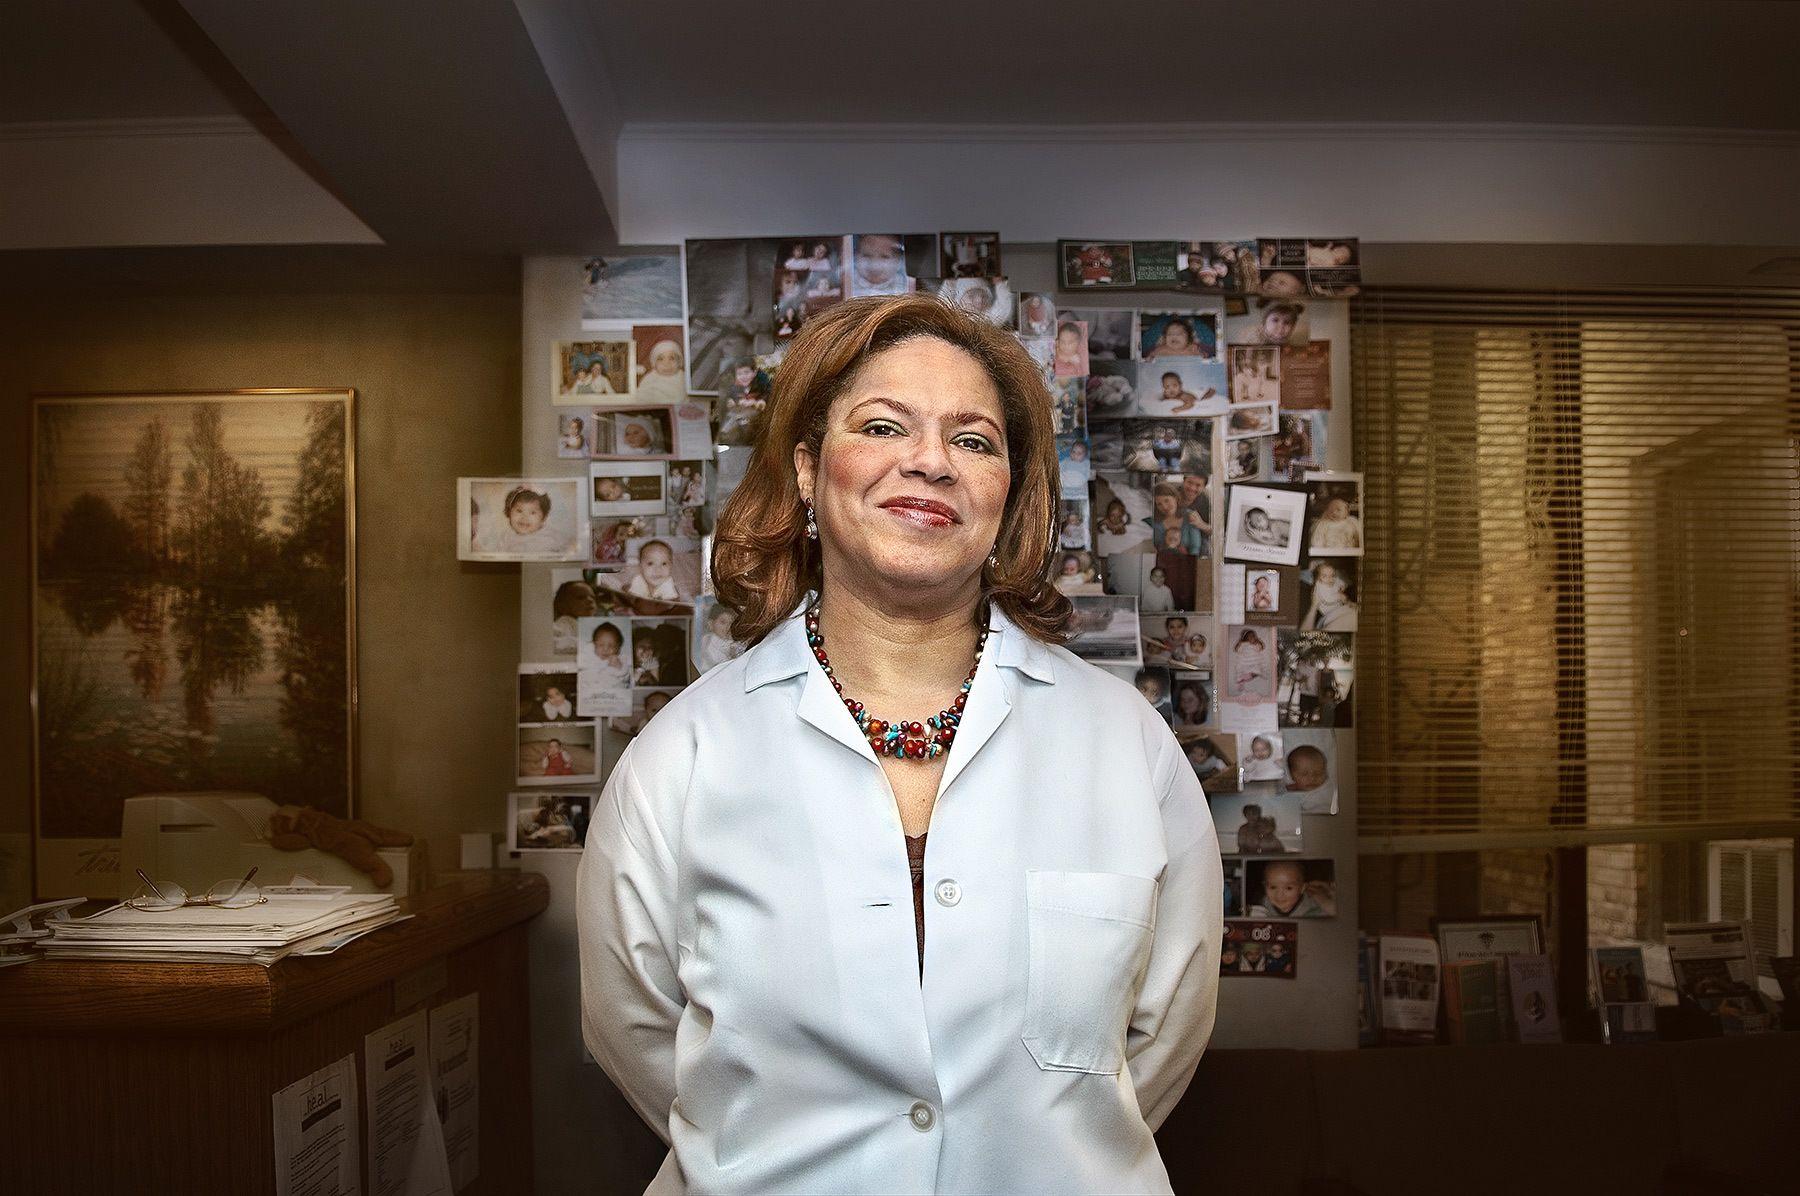 JUANITA JENYONS, MUJER DOMINICANA EN N.Y. 2008